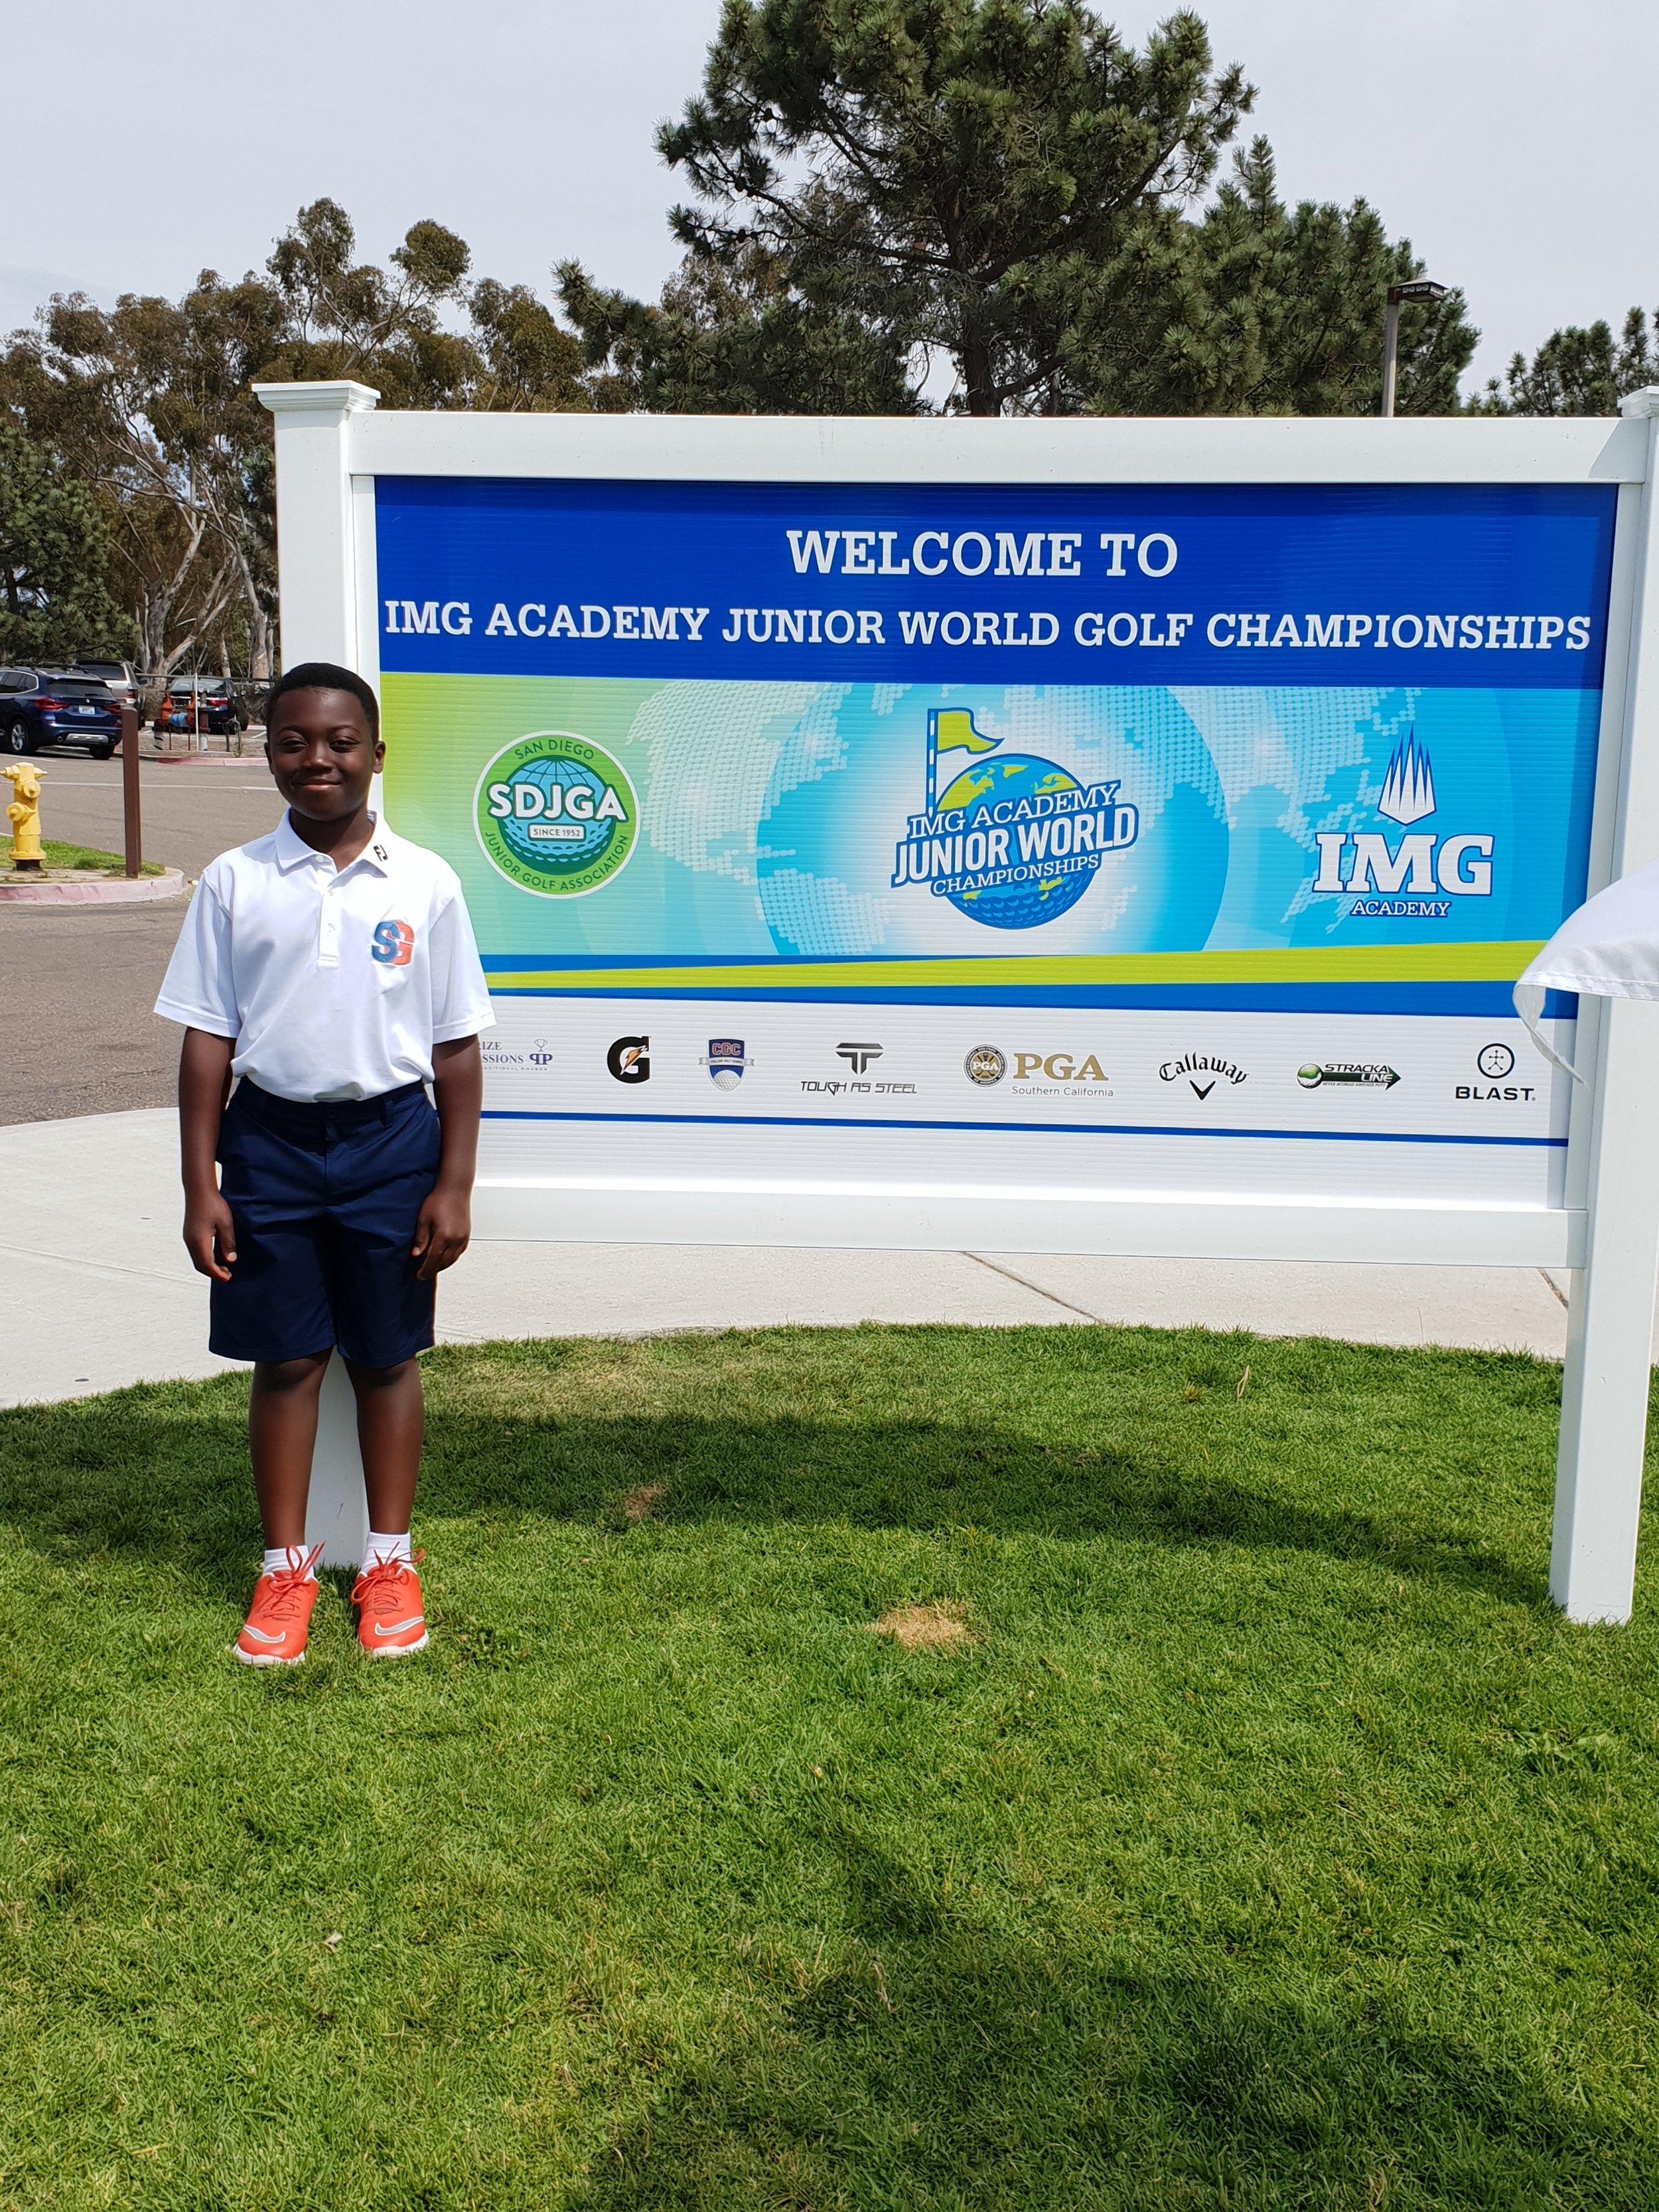 2018 IMG academy JUNIOR WORLD championship